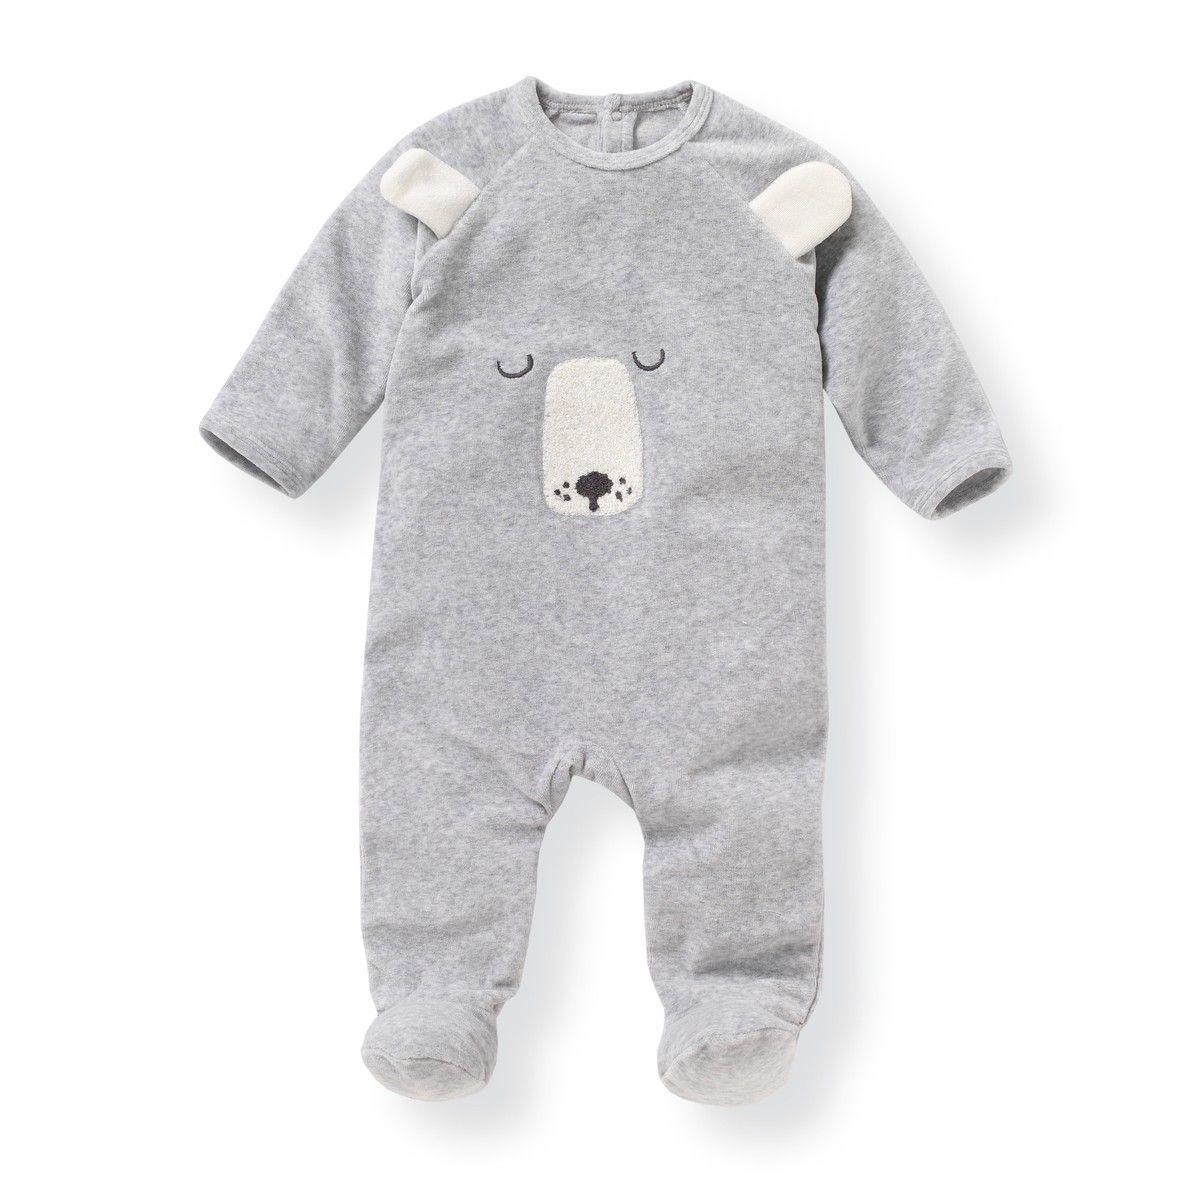 Pijama Para Recien Nacido De Terciopelo 0 Meses 3 Anos Lote De